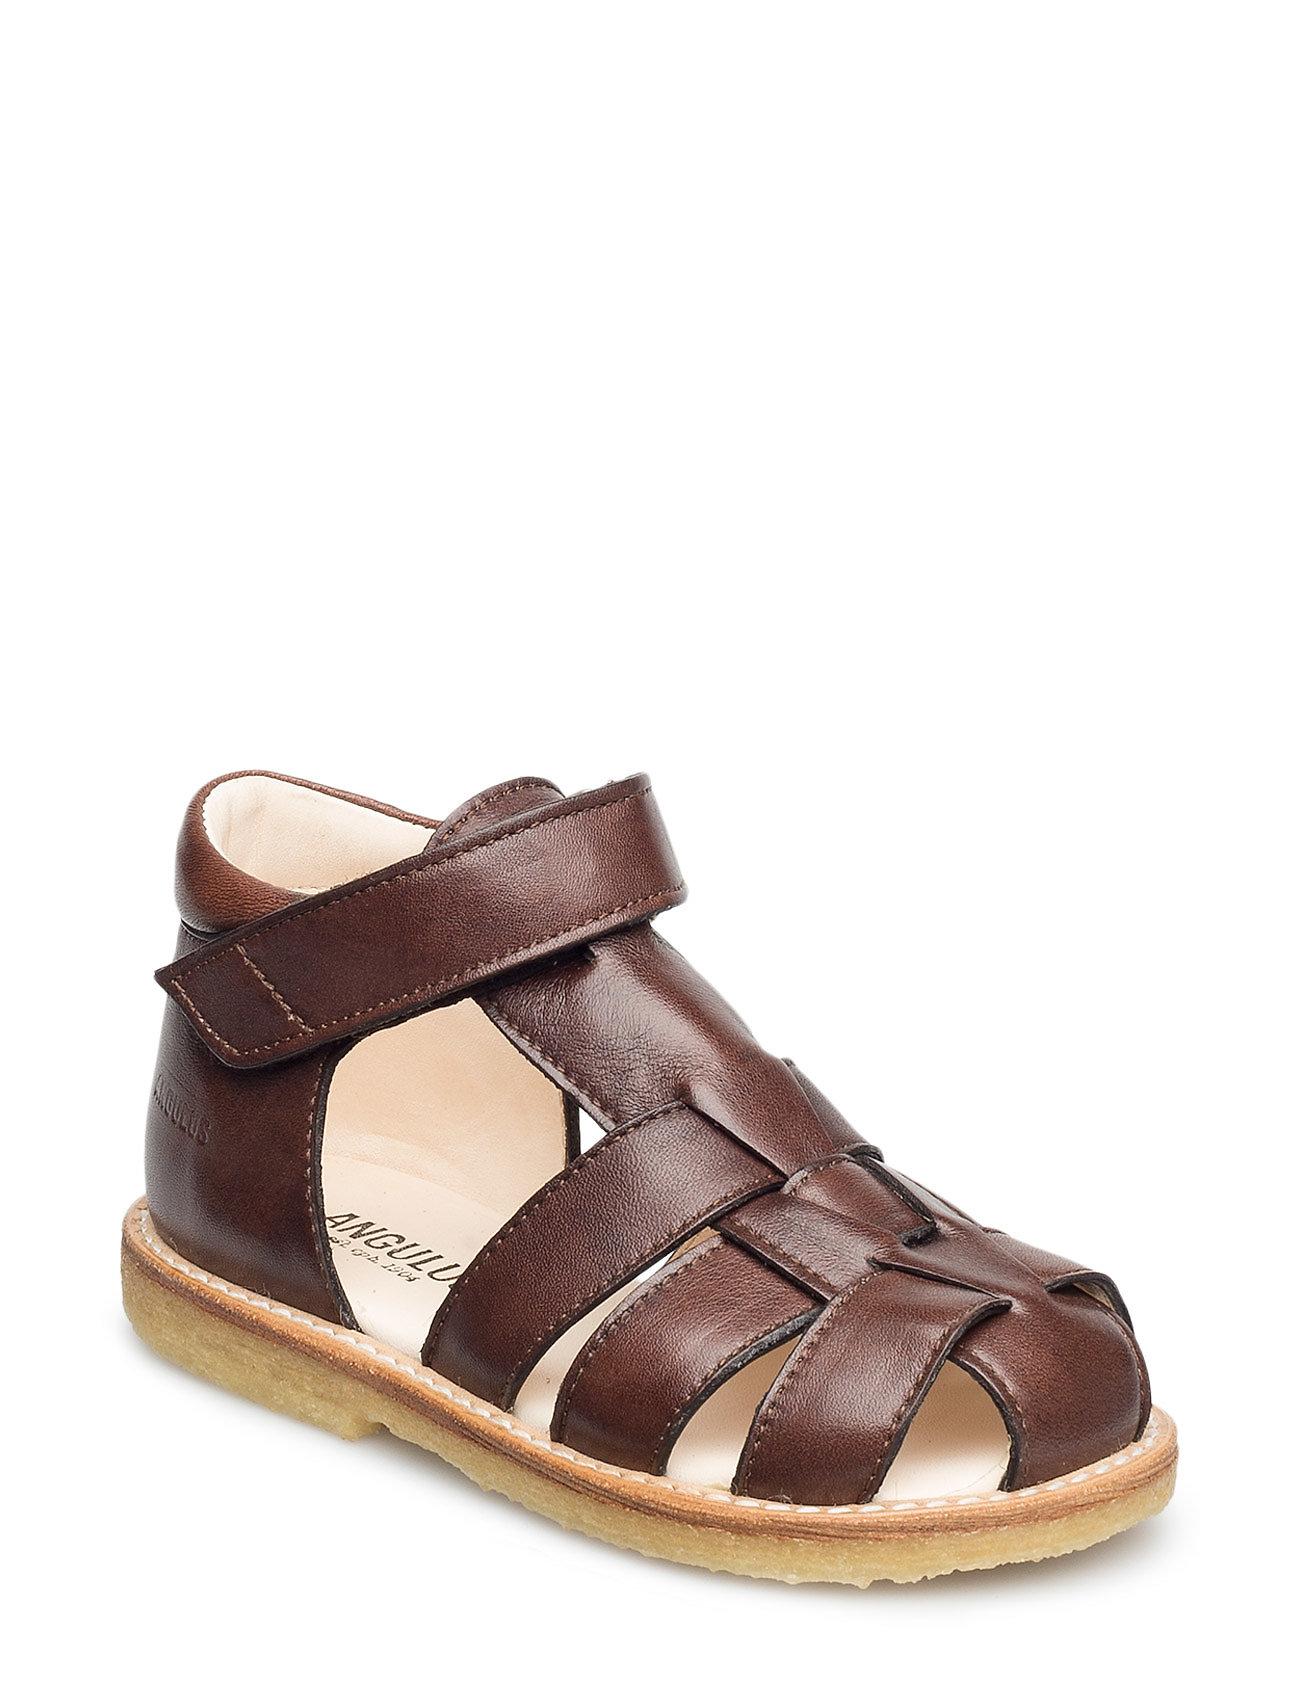 b849bb06e37 ANGULUS sandaler – Baby Sandal til børn i 2164 LEOPARD - Pashion.dk